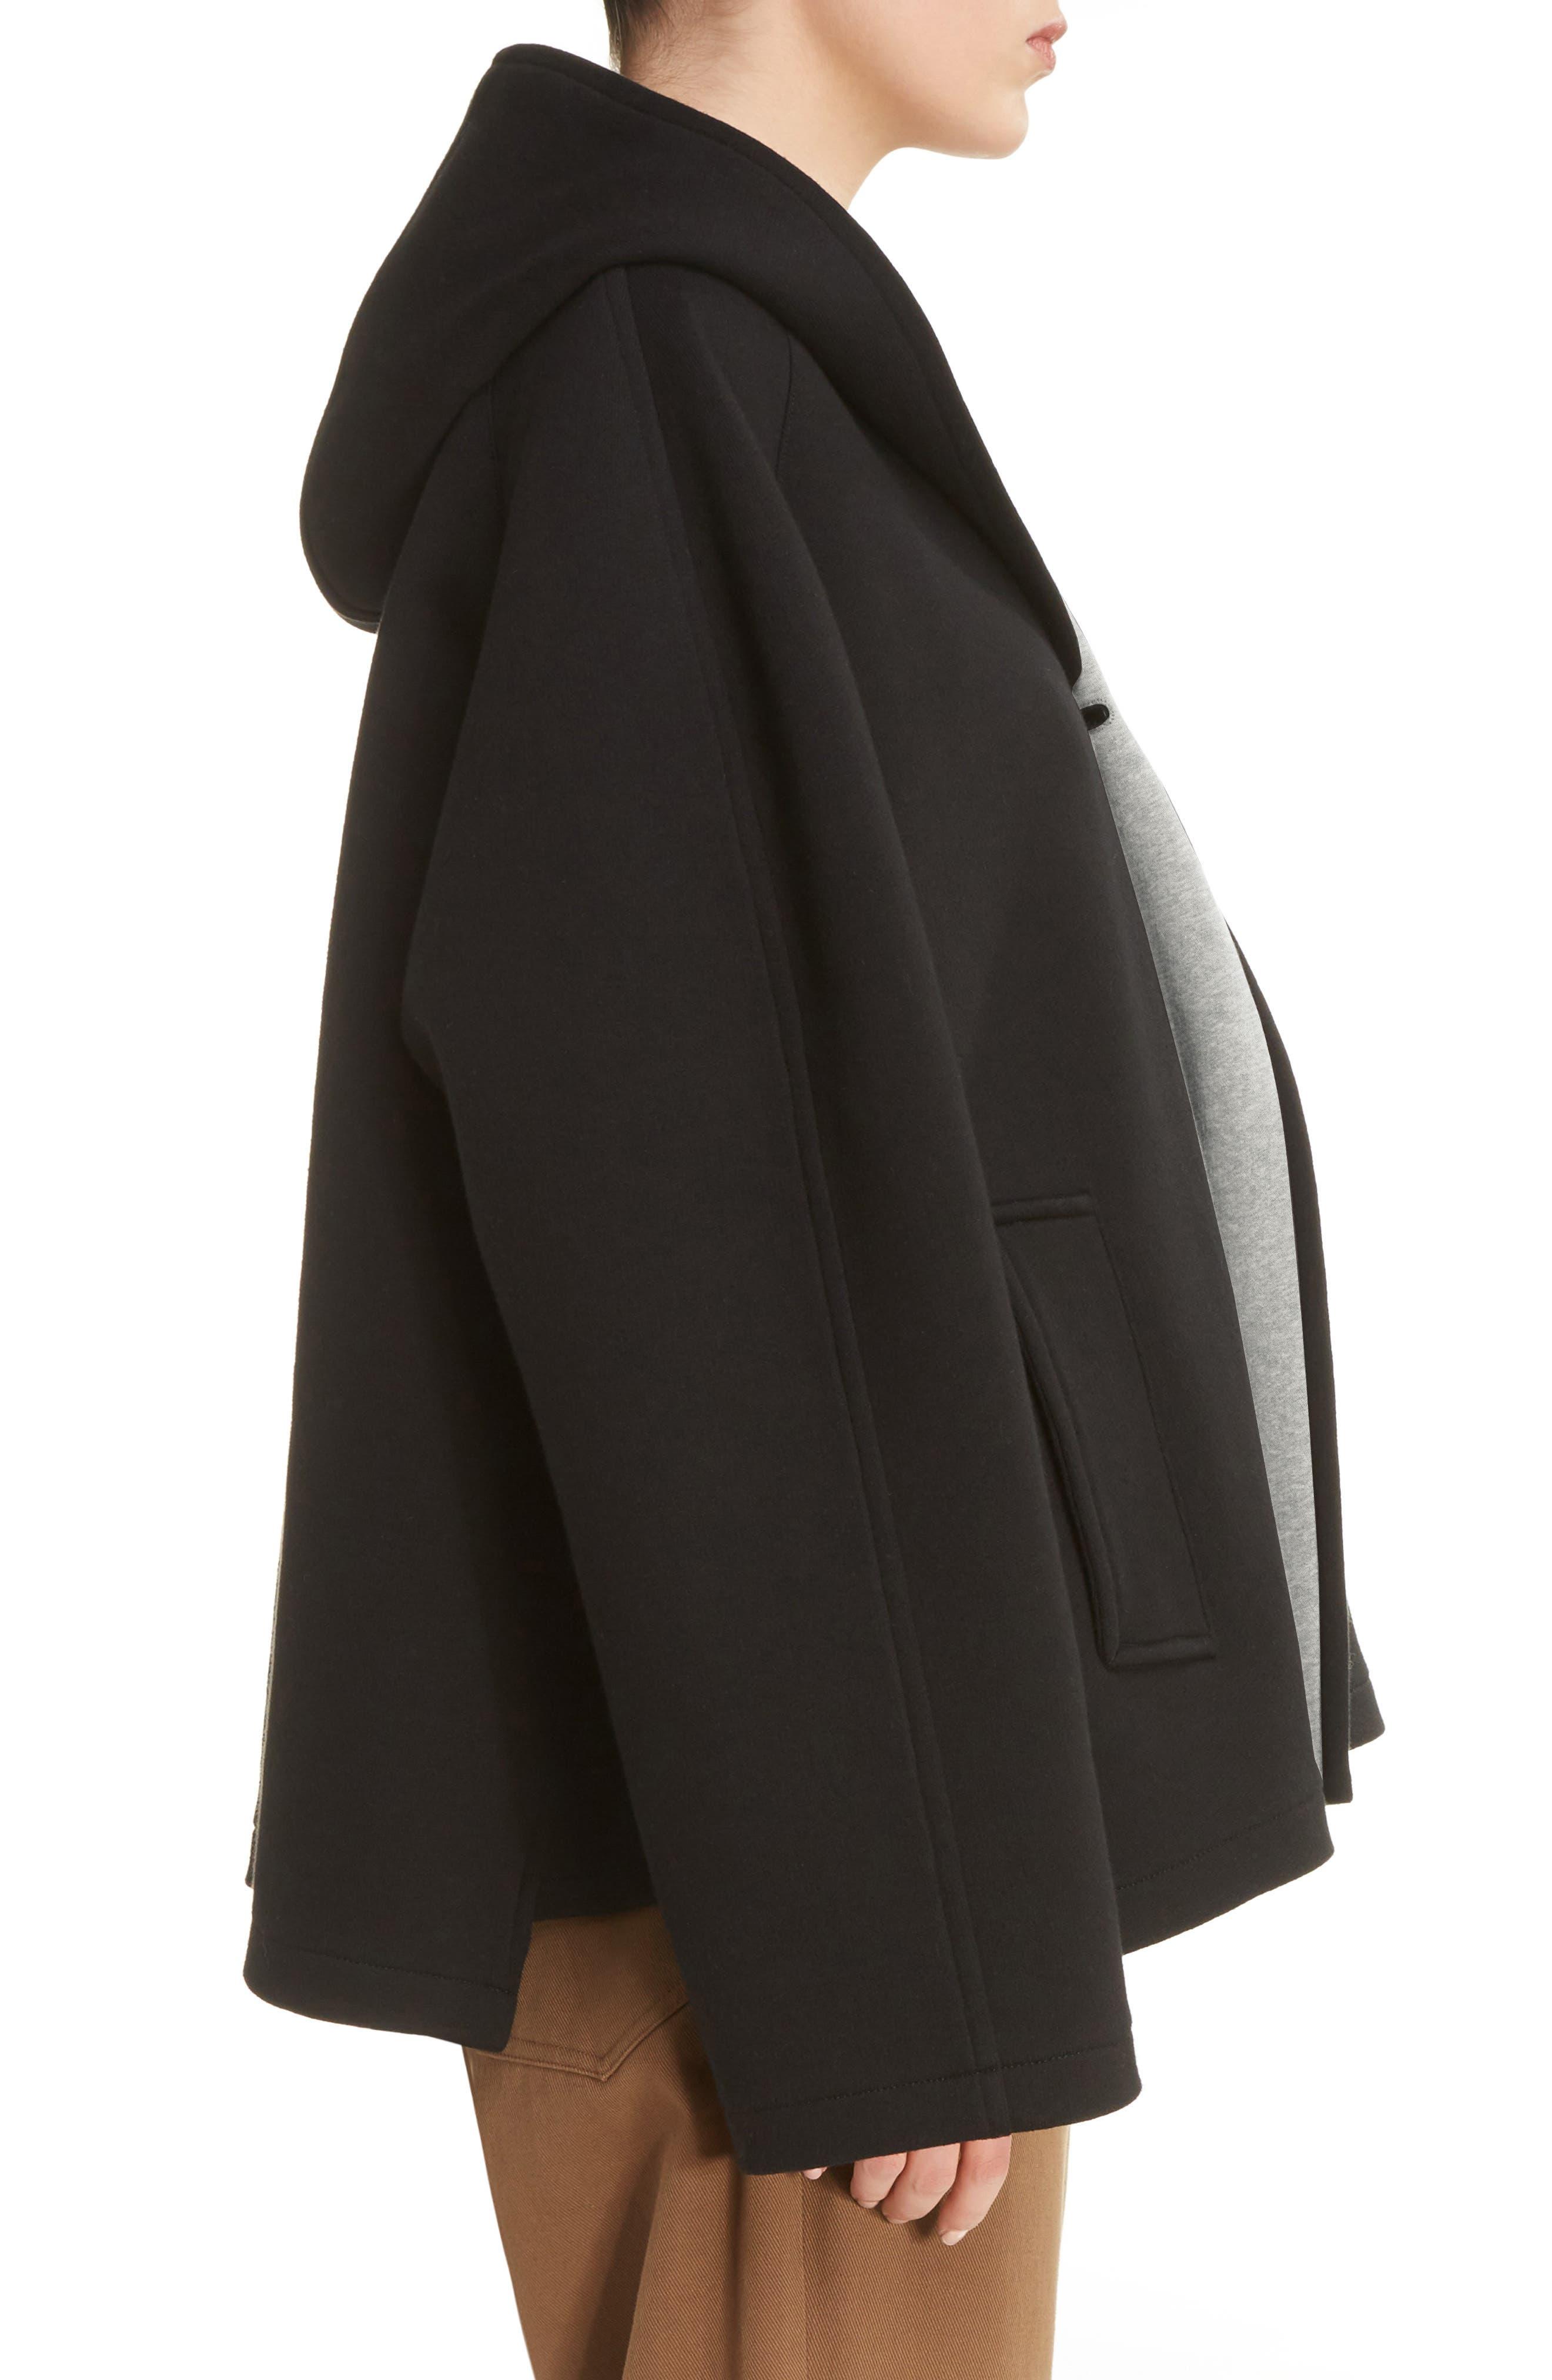 U-Hood Short Jacket,                             Alternate thumbnail 3, color,                             020